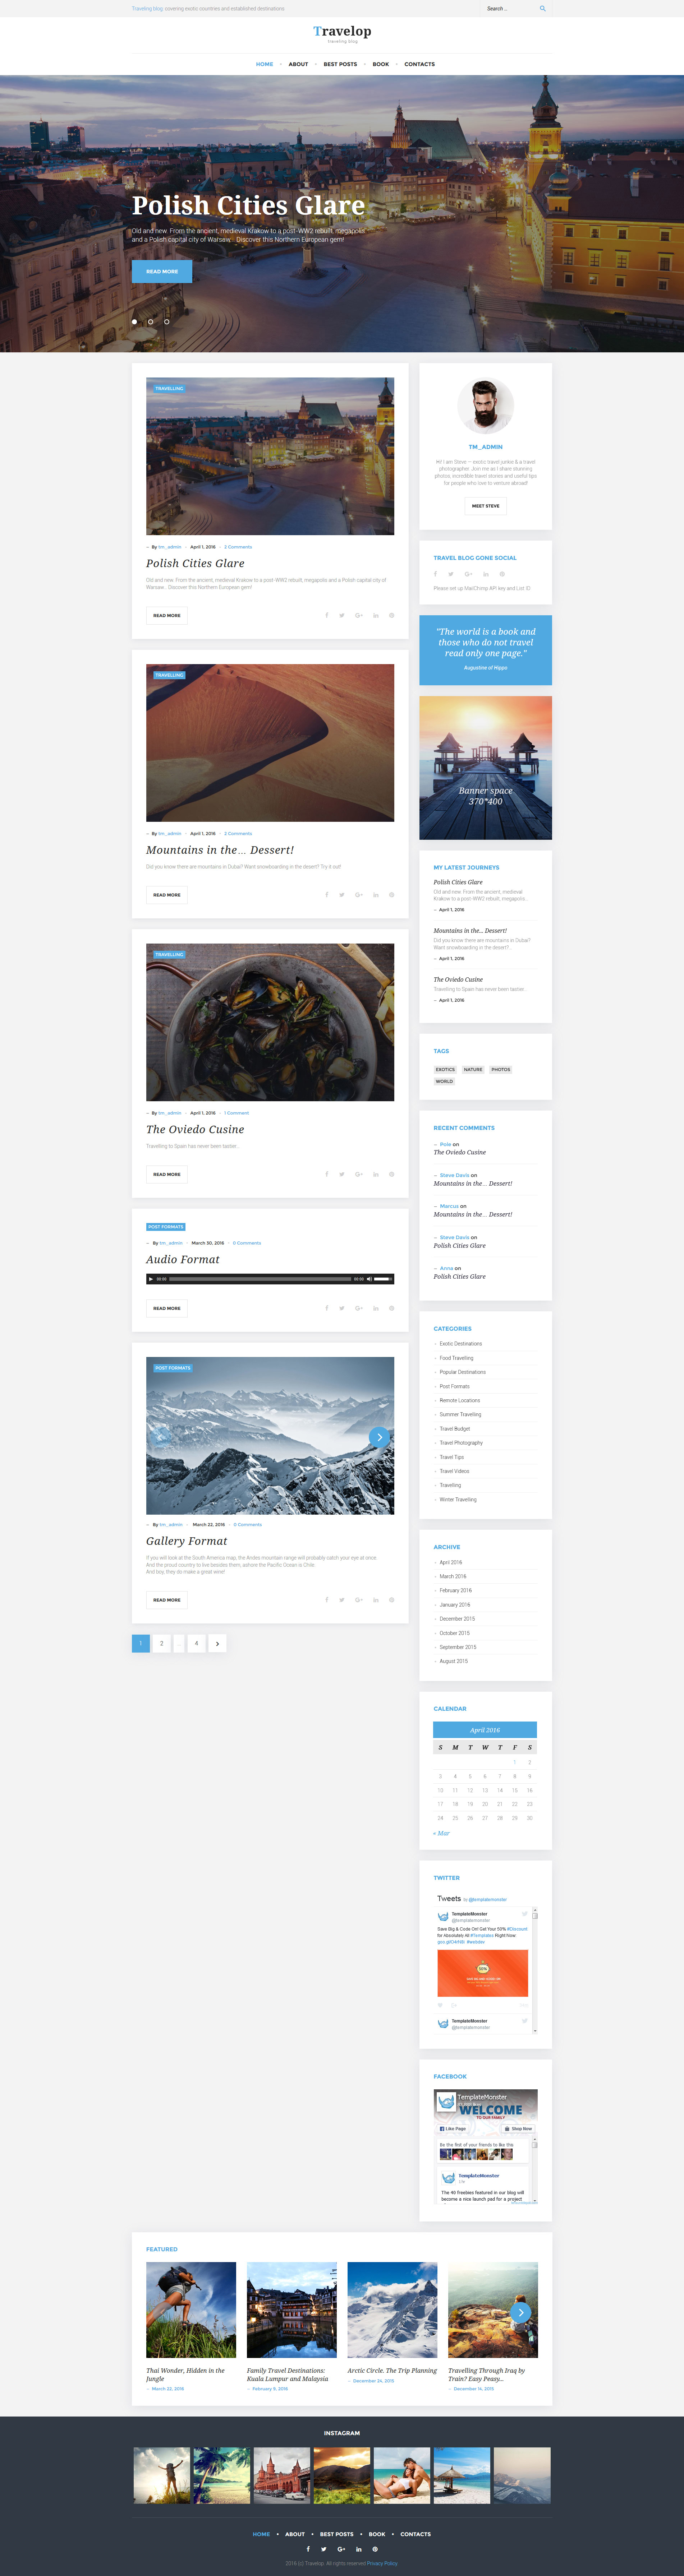 Travelop - Traveling Blog Tema WordPress №58534 - captura de tela